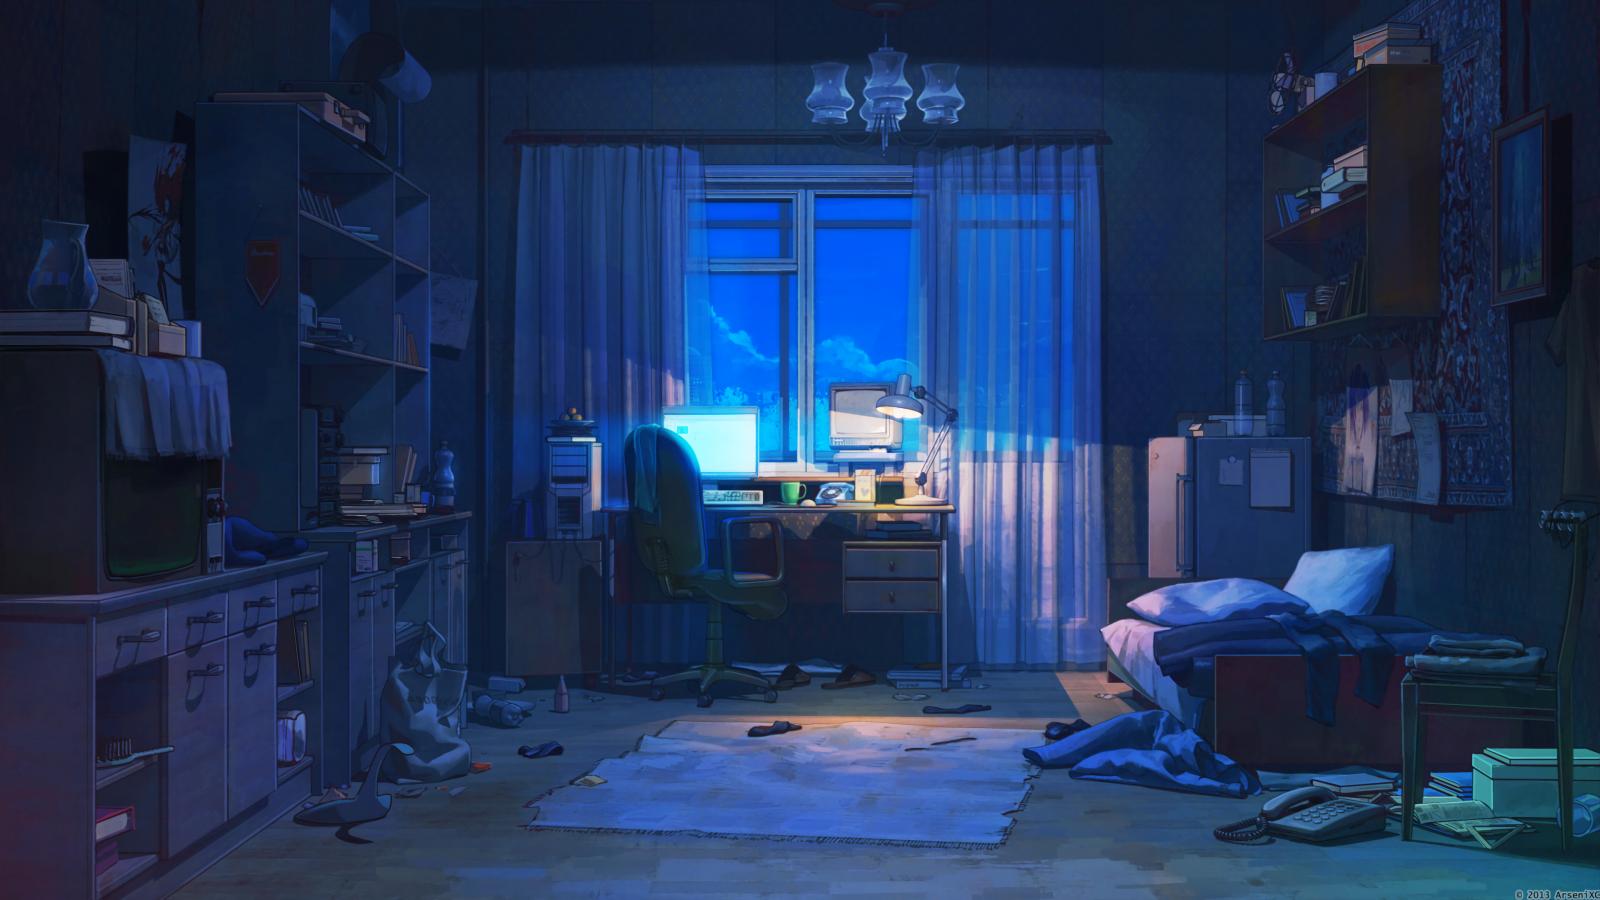 Wallpaper : anime, room, interior, dark 3840x2160 - Jimp ...